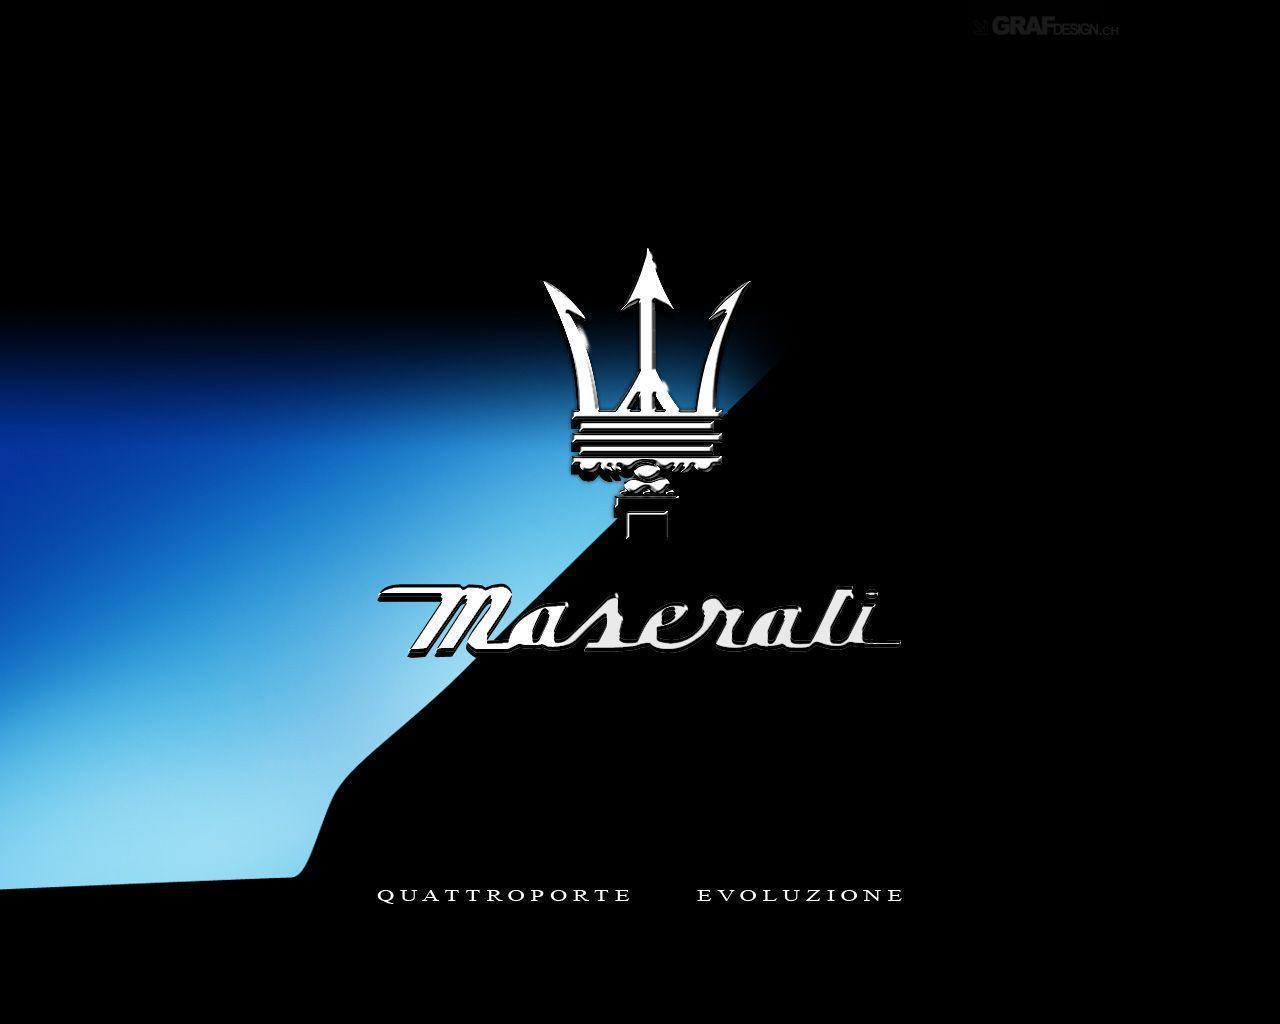 Maserati Logo Wallpaper | | Maserati | Pinterest | Logos, Cars and .